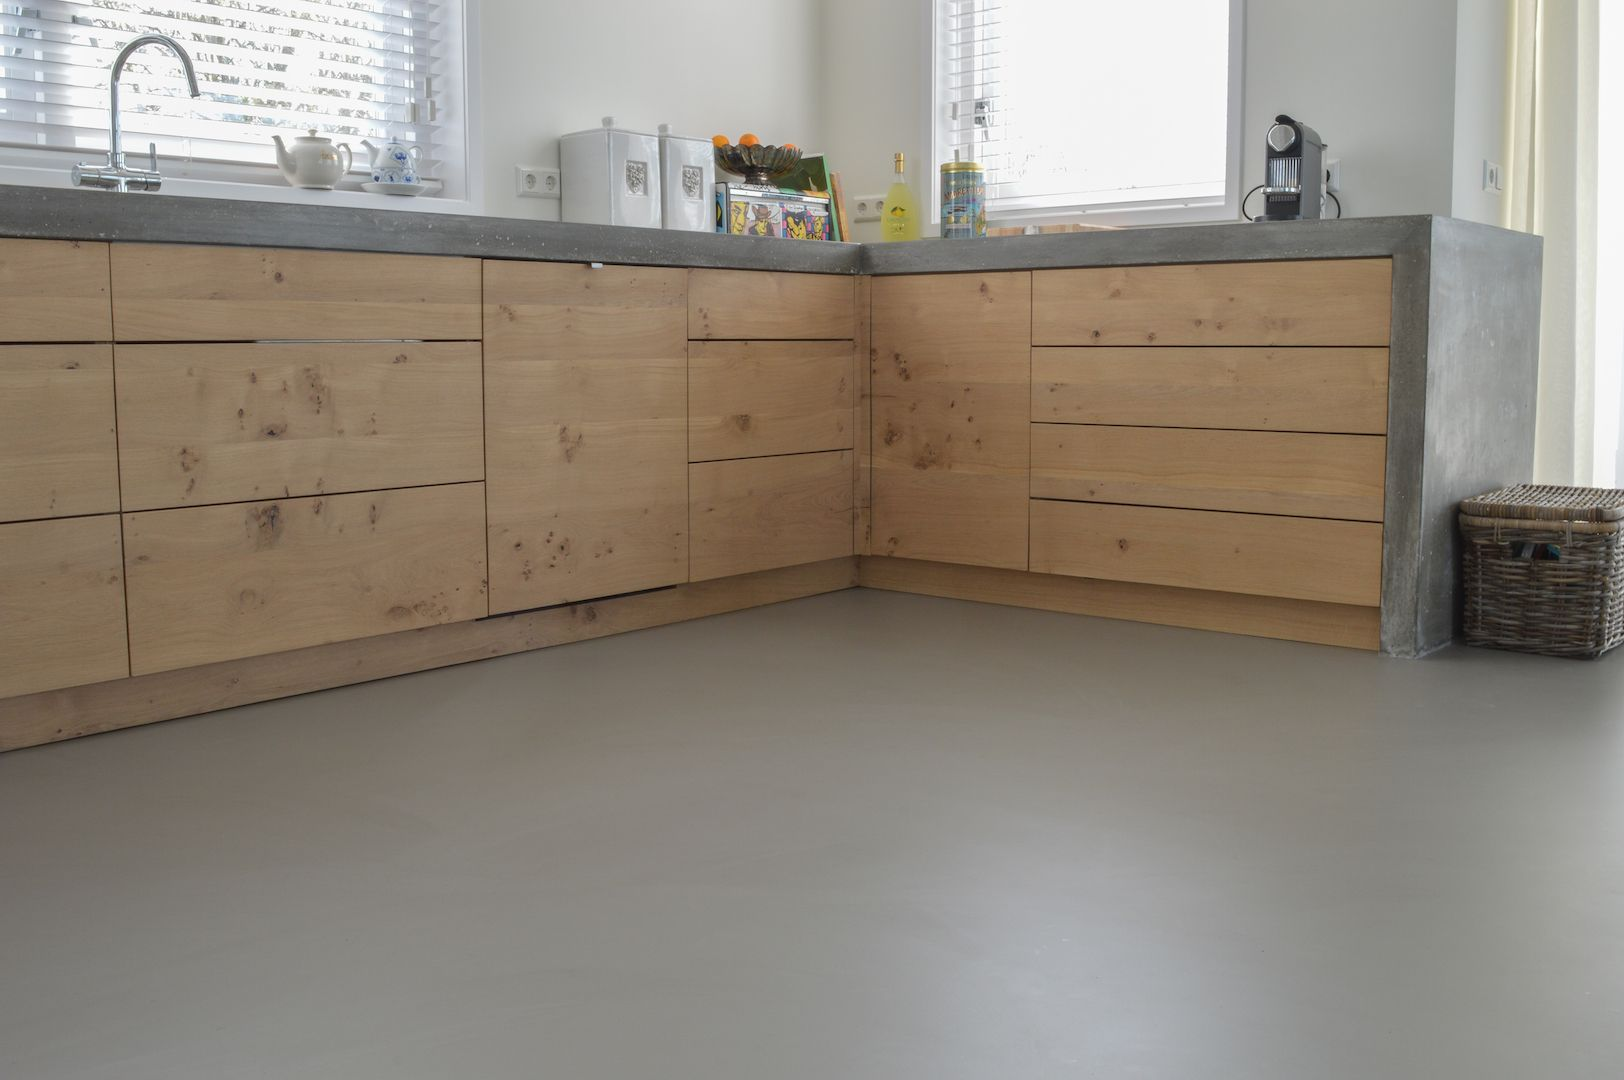 Gietvloer Op Beton : Eiken & beton & solo gietvloer kookeiland pinterest betonküche